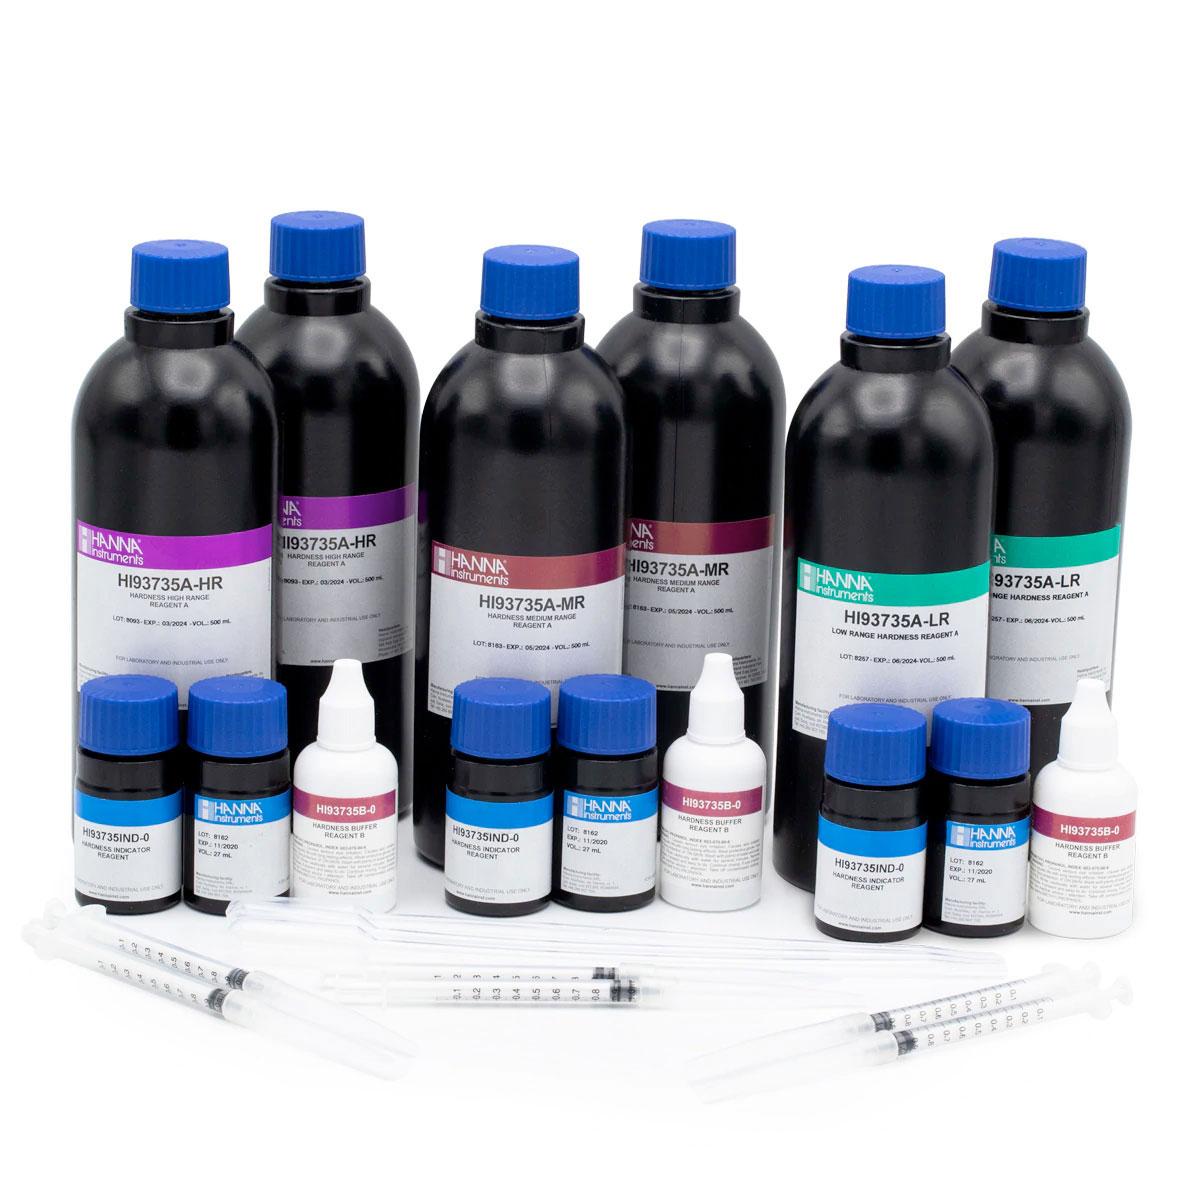 Total Hardness Colorimetric Reagents (100 tests) - HI93735-0